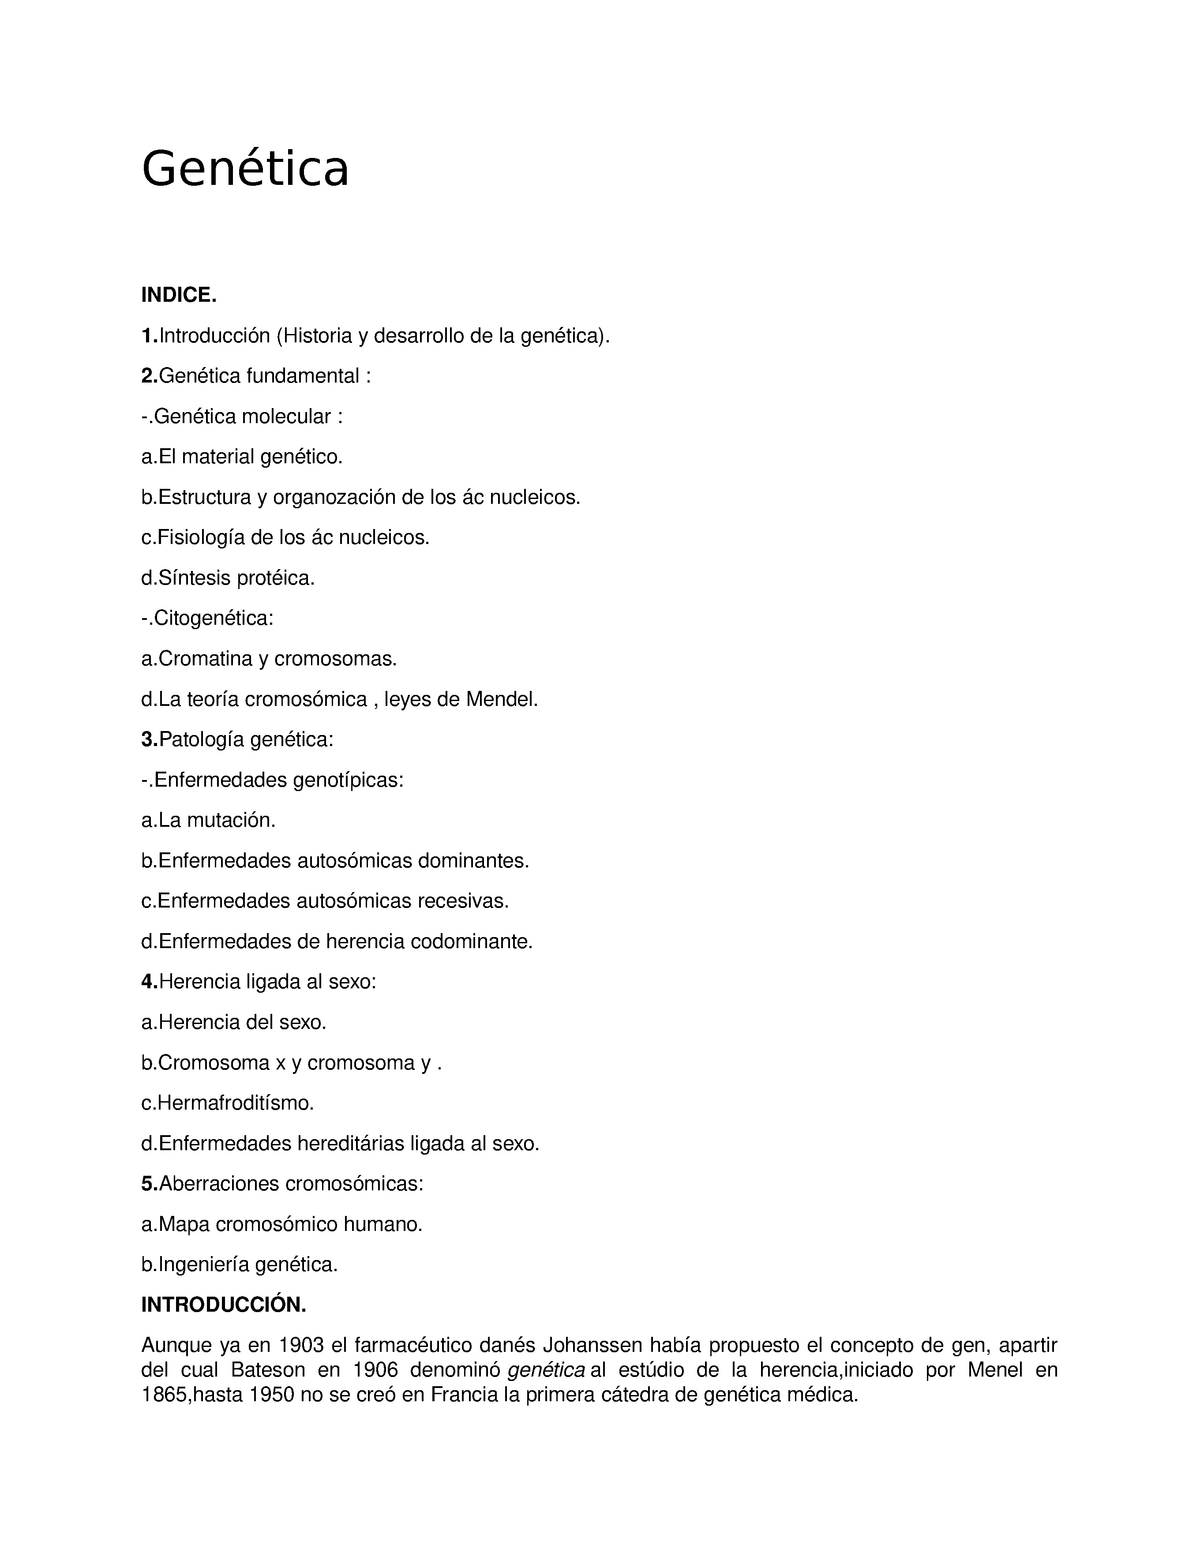 Genetica Ensayo Nota 9 Genética Uanl Studocu